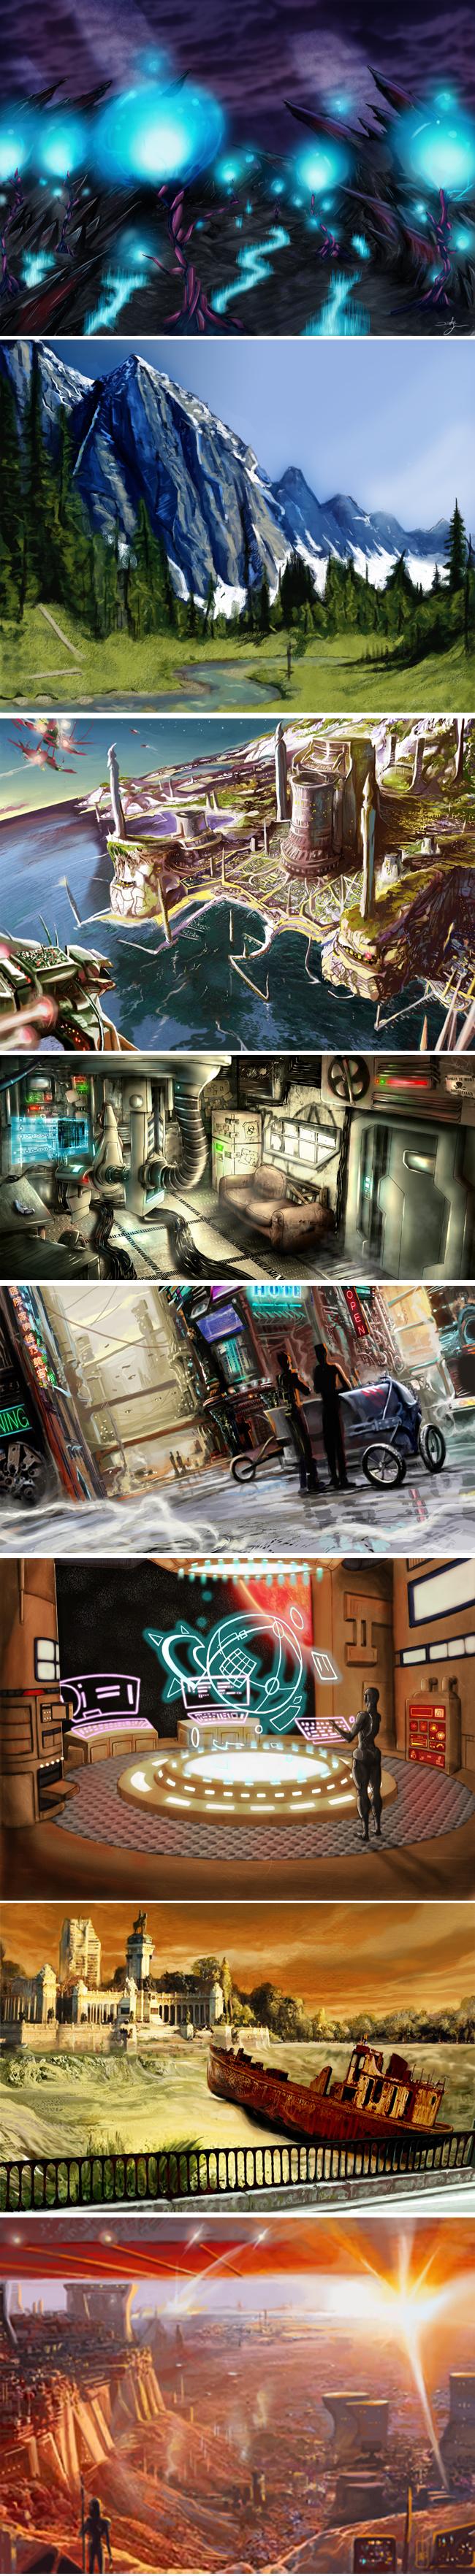 escenarios-arte-digital-academiac10-madrid